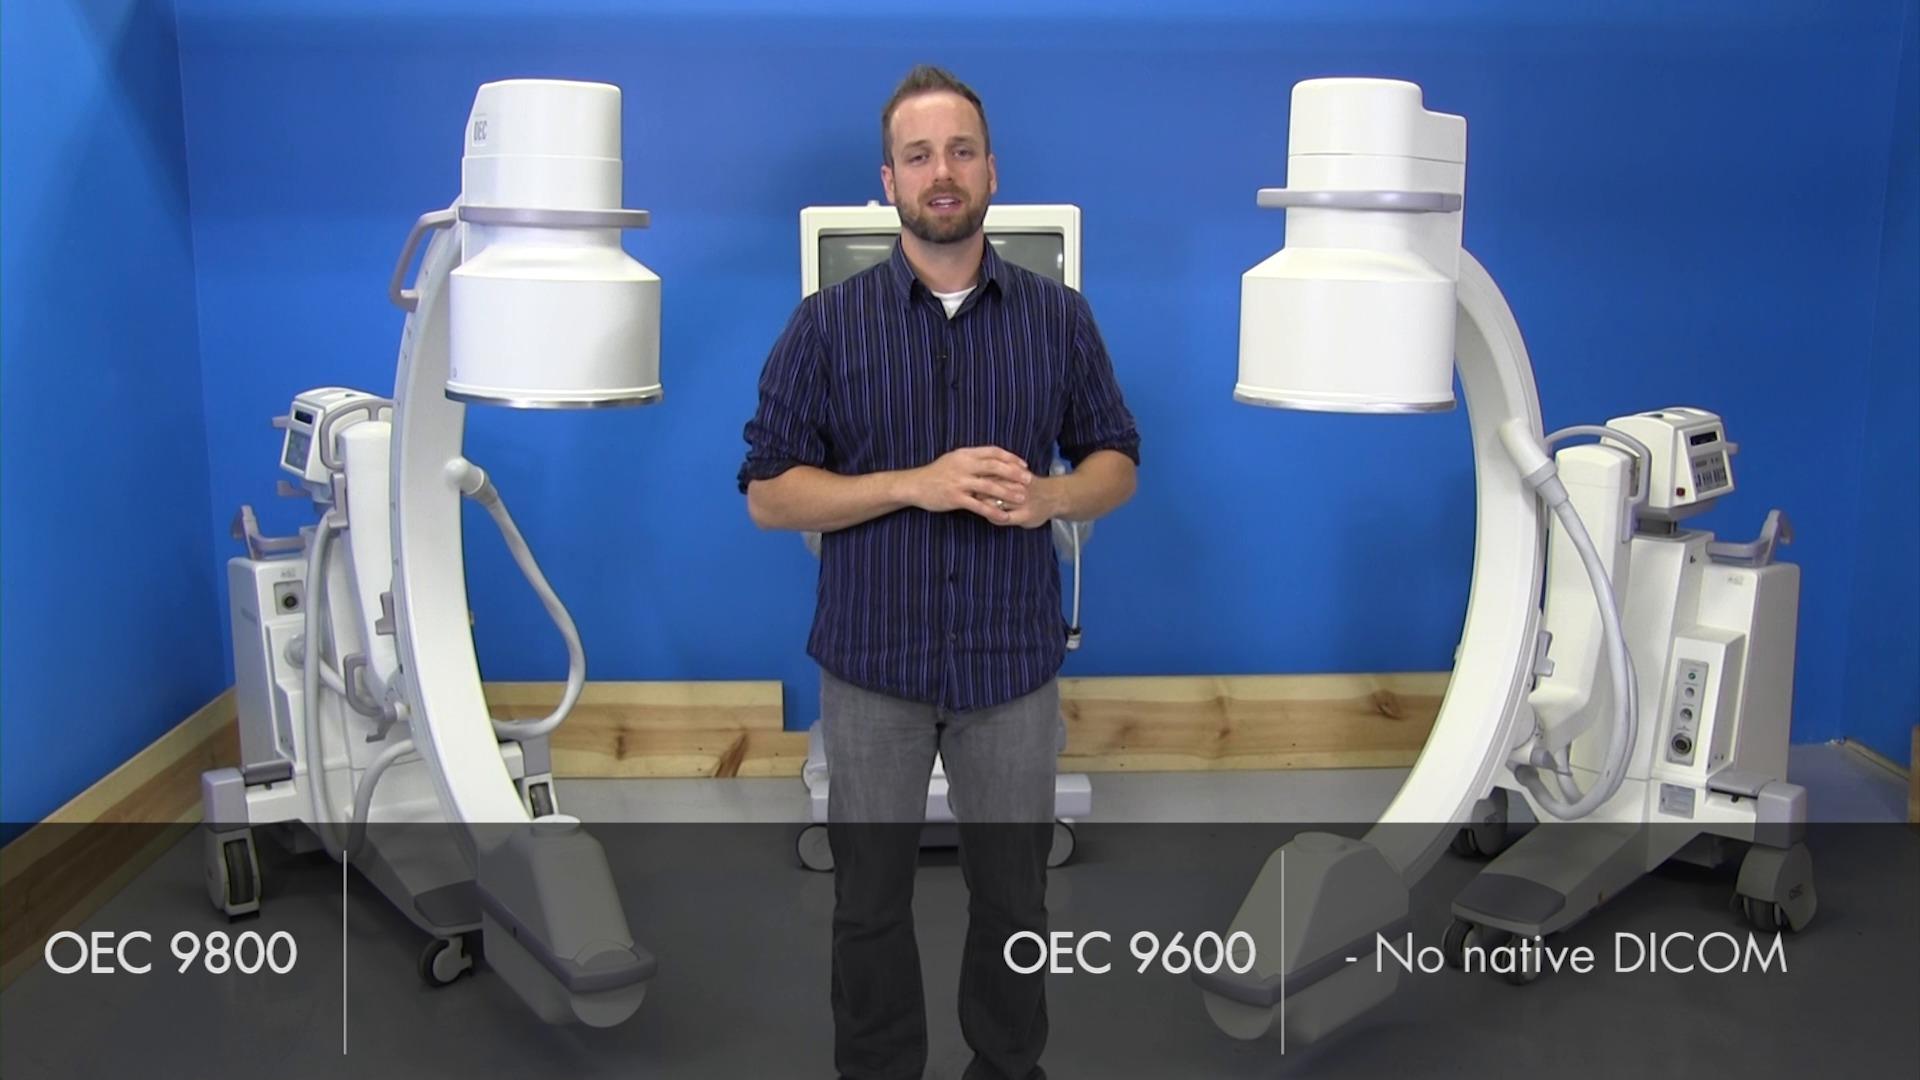 OEC 9800 C-Arm vs OEC 9600 C-Arm Video